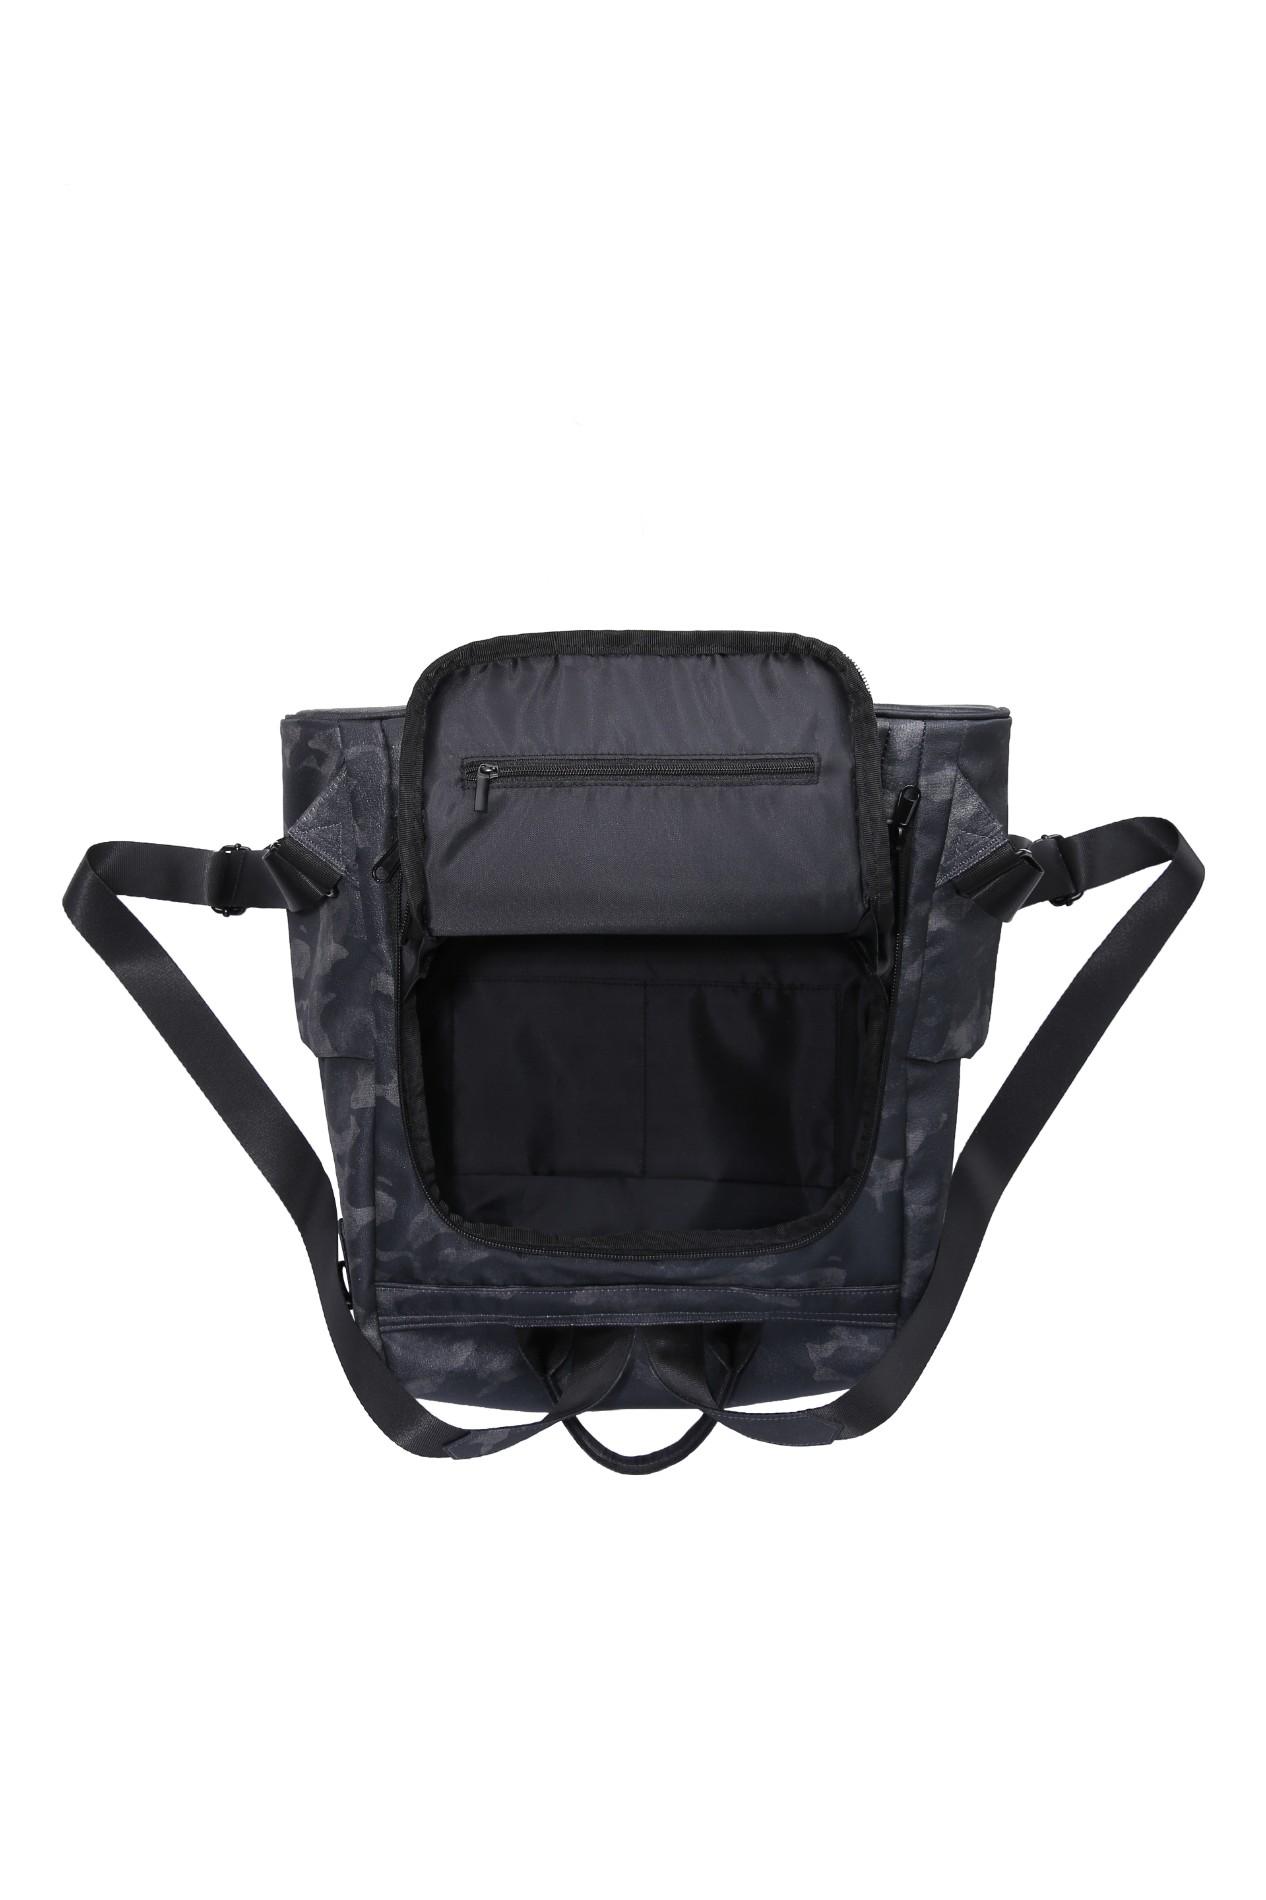 Backpack Women Manufacturers, Backpack Women Factory, Supply Backpack Women